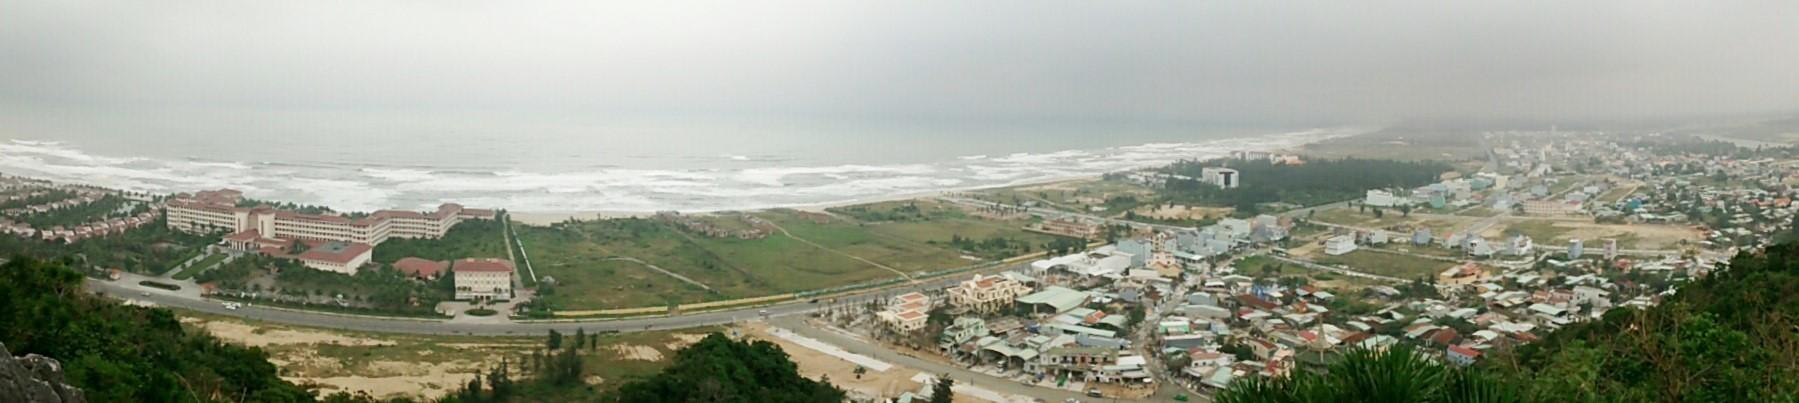 Đà Nẵng Marmorberge Panorama vom Gipfel